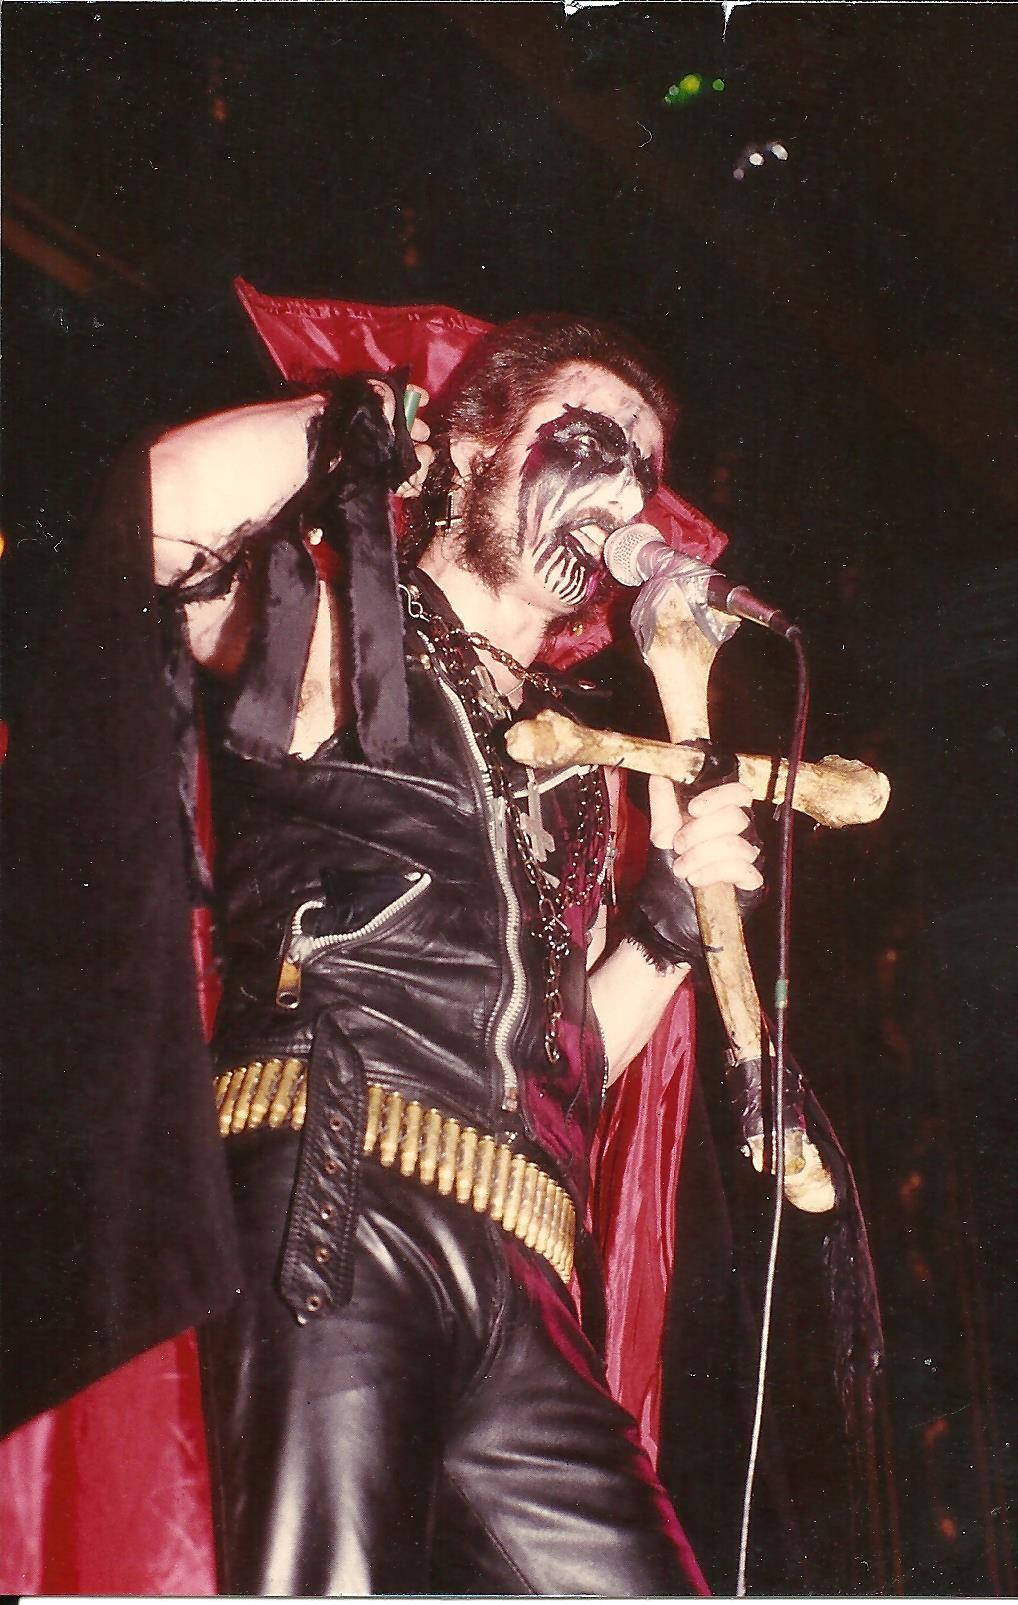 King Diamond Oh No His Makeup Is Melting King Diamond Mercyful Fate King